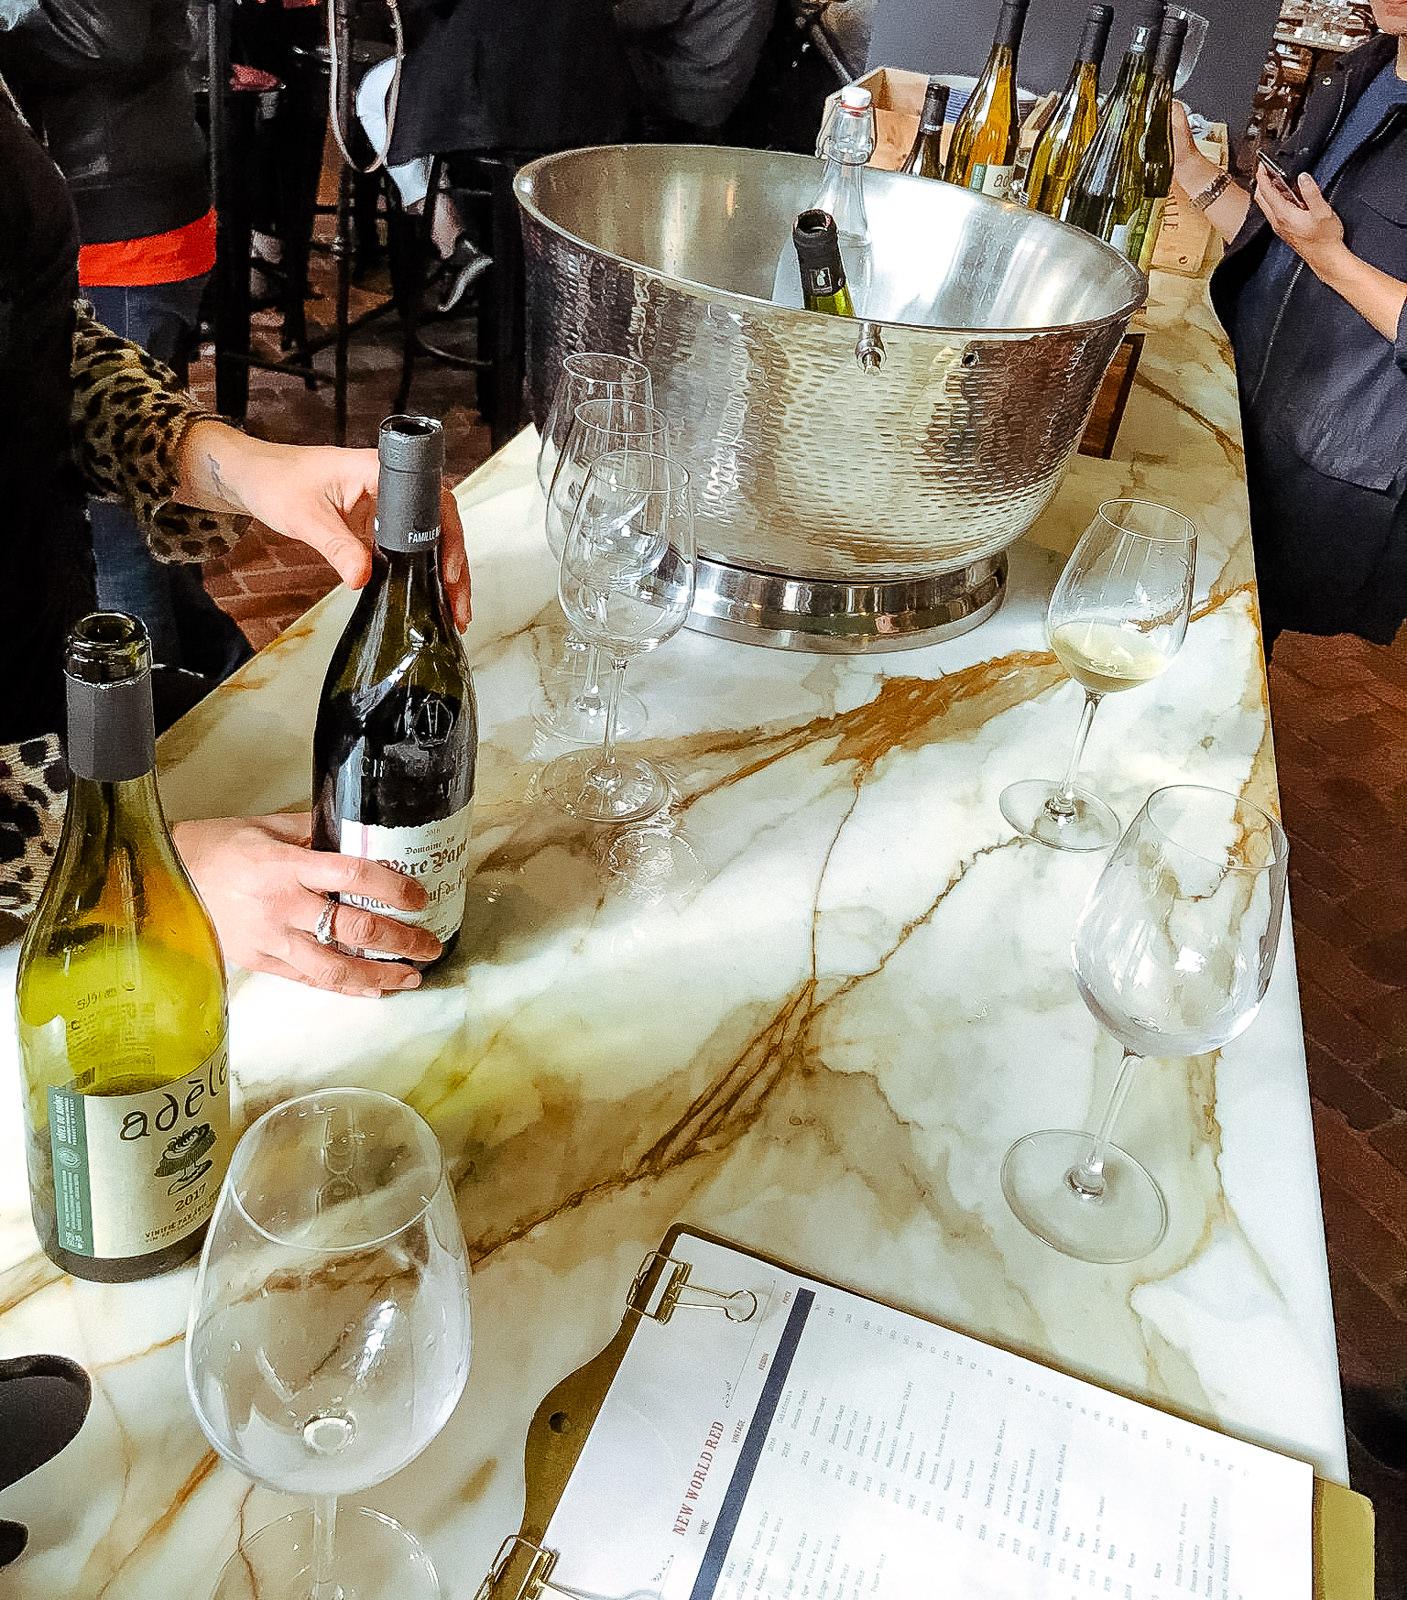 perry-lane-hotel-wine-tasting-savannah-georgia